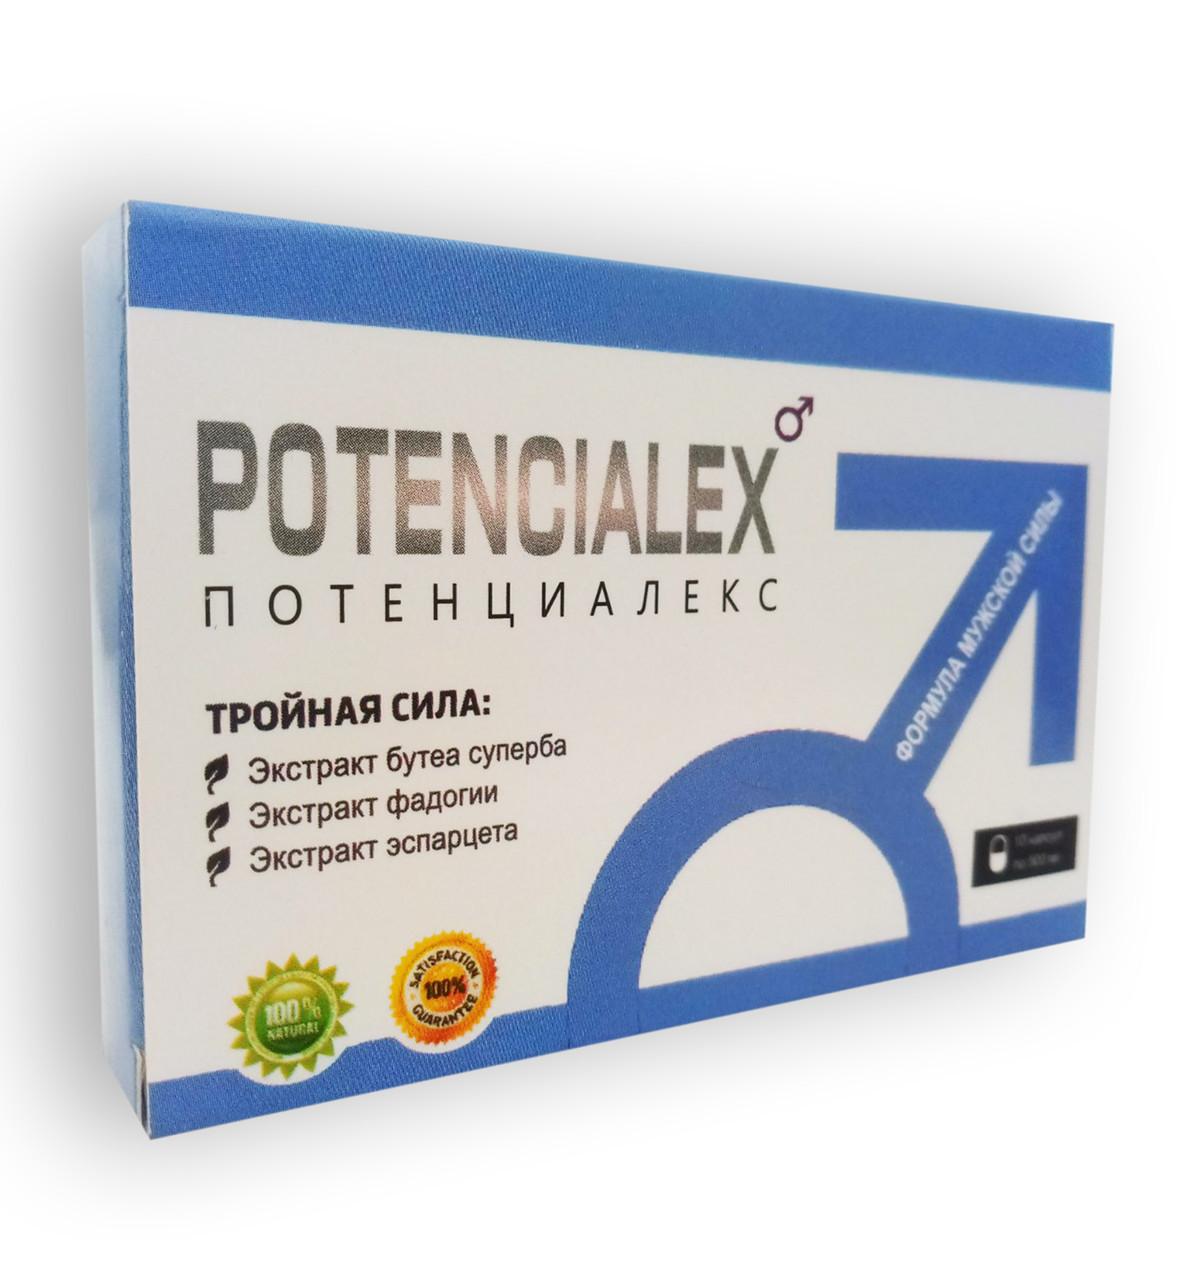 Potencialex - Капсулы для потенции (Потенциалекс)